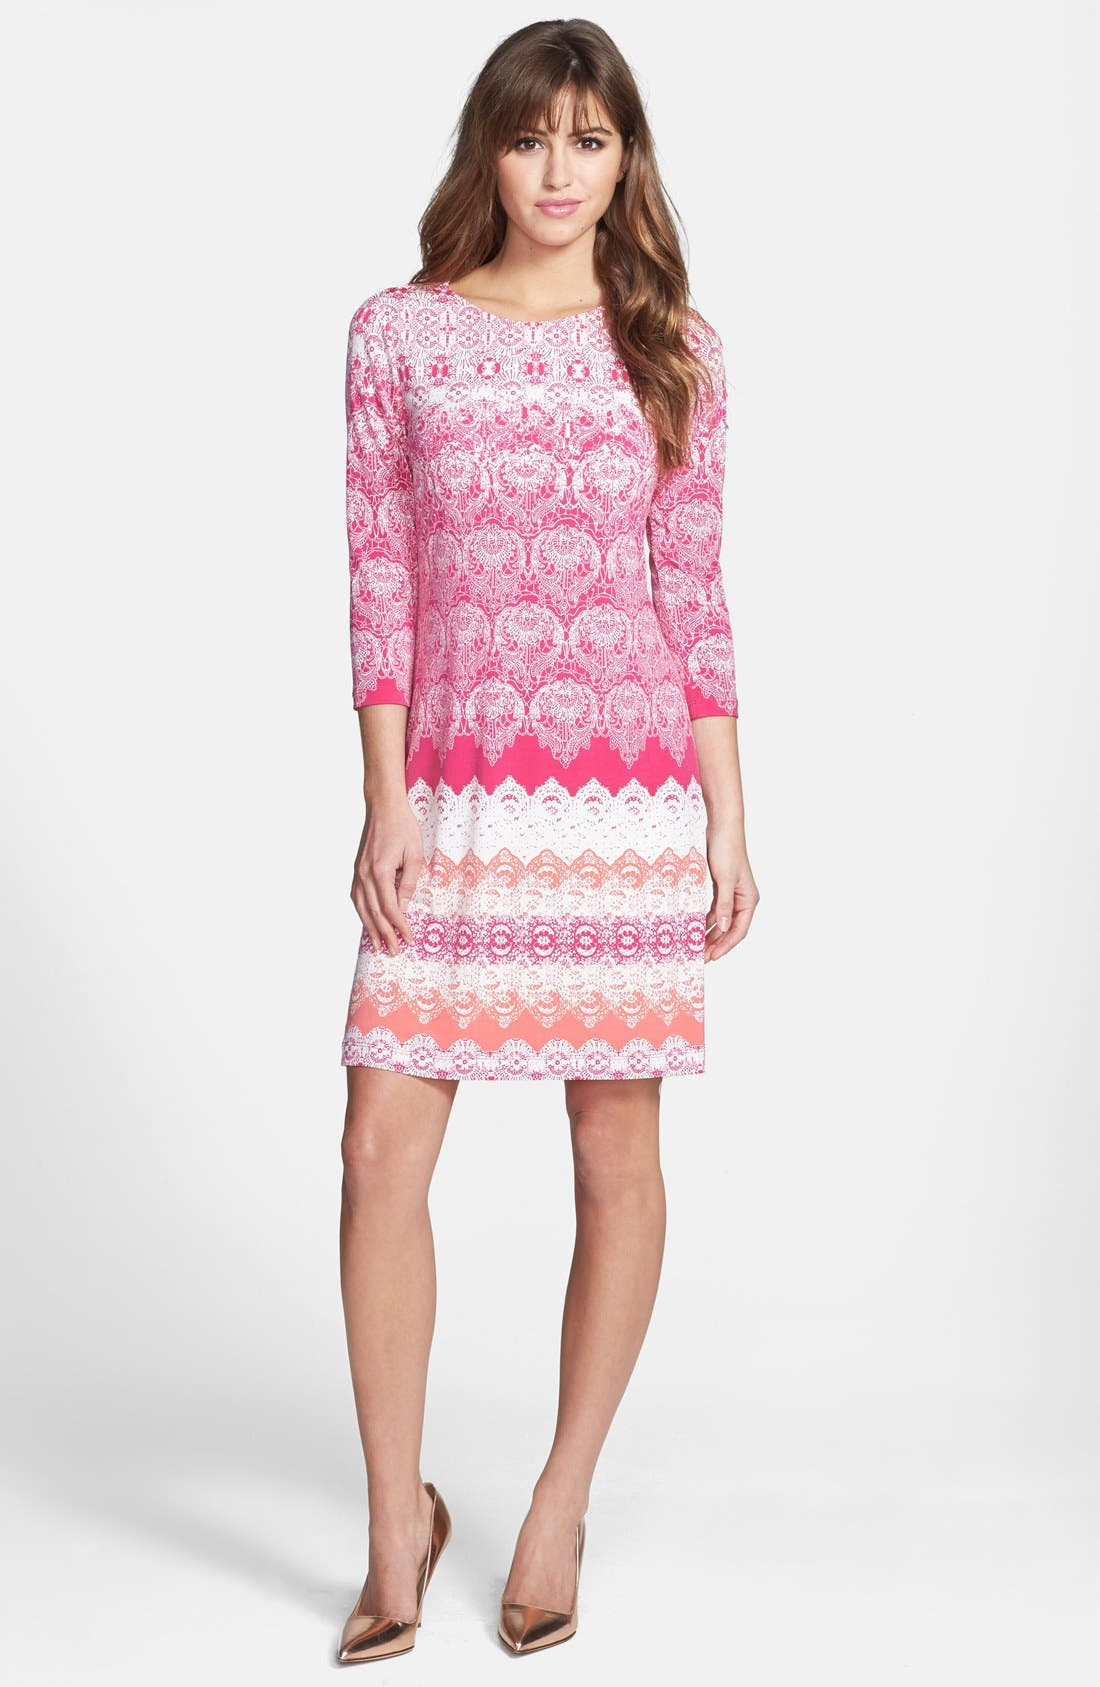 Alternate Image 1 Selected - Donna Morgan Lace Print Shift Dress